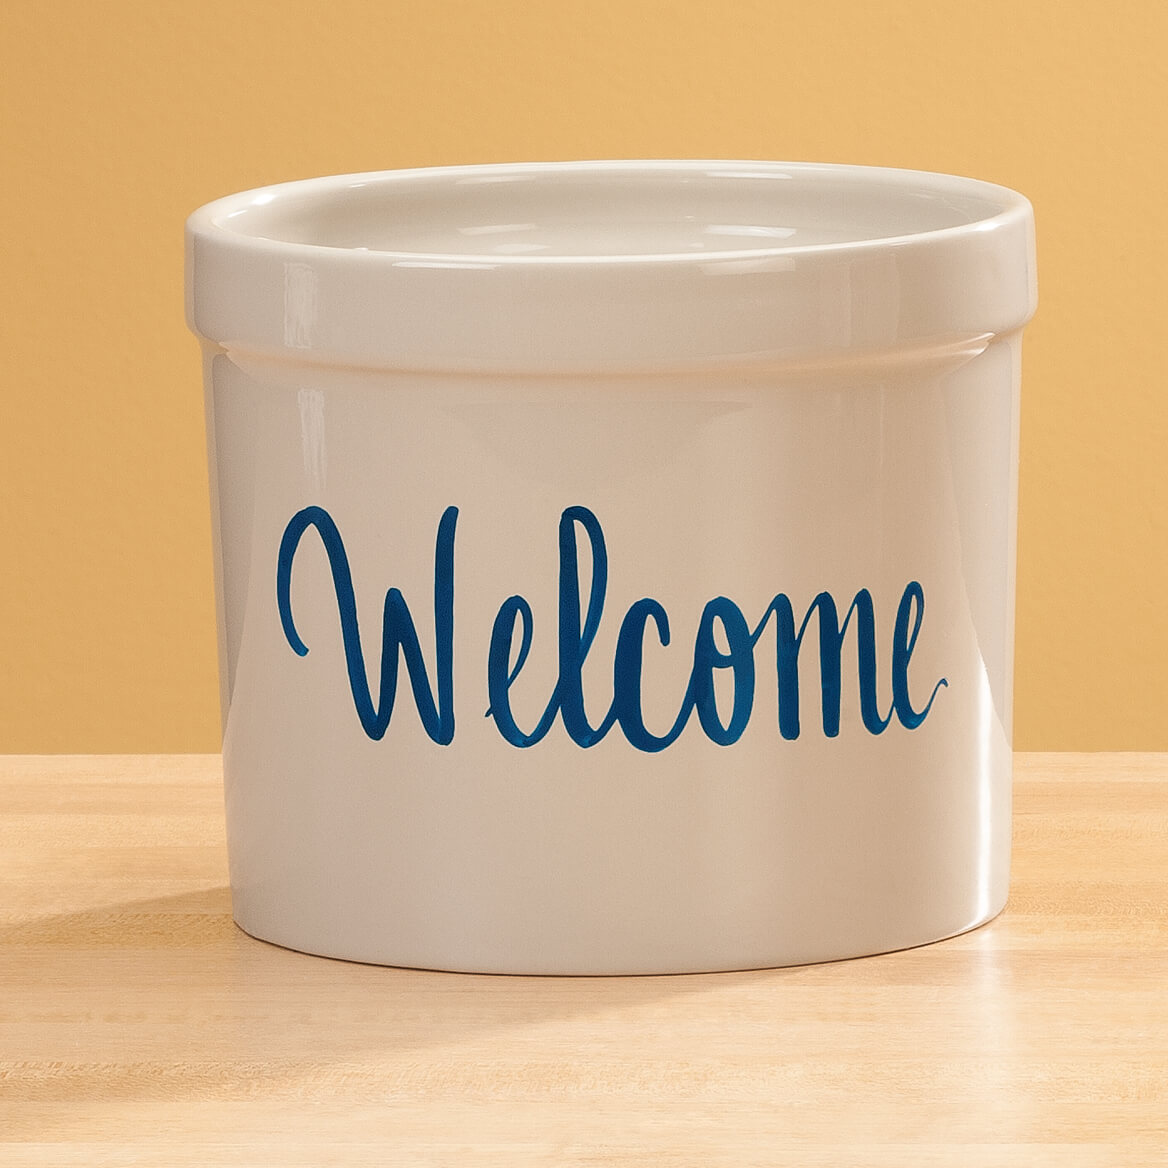 Personalized Stoneware Crock 3 Quart-360771